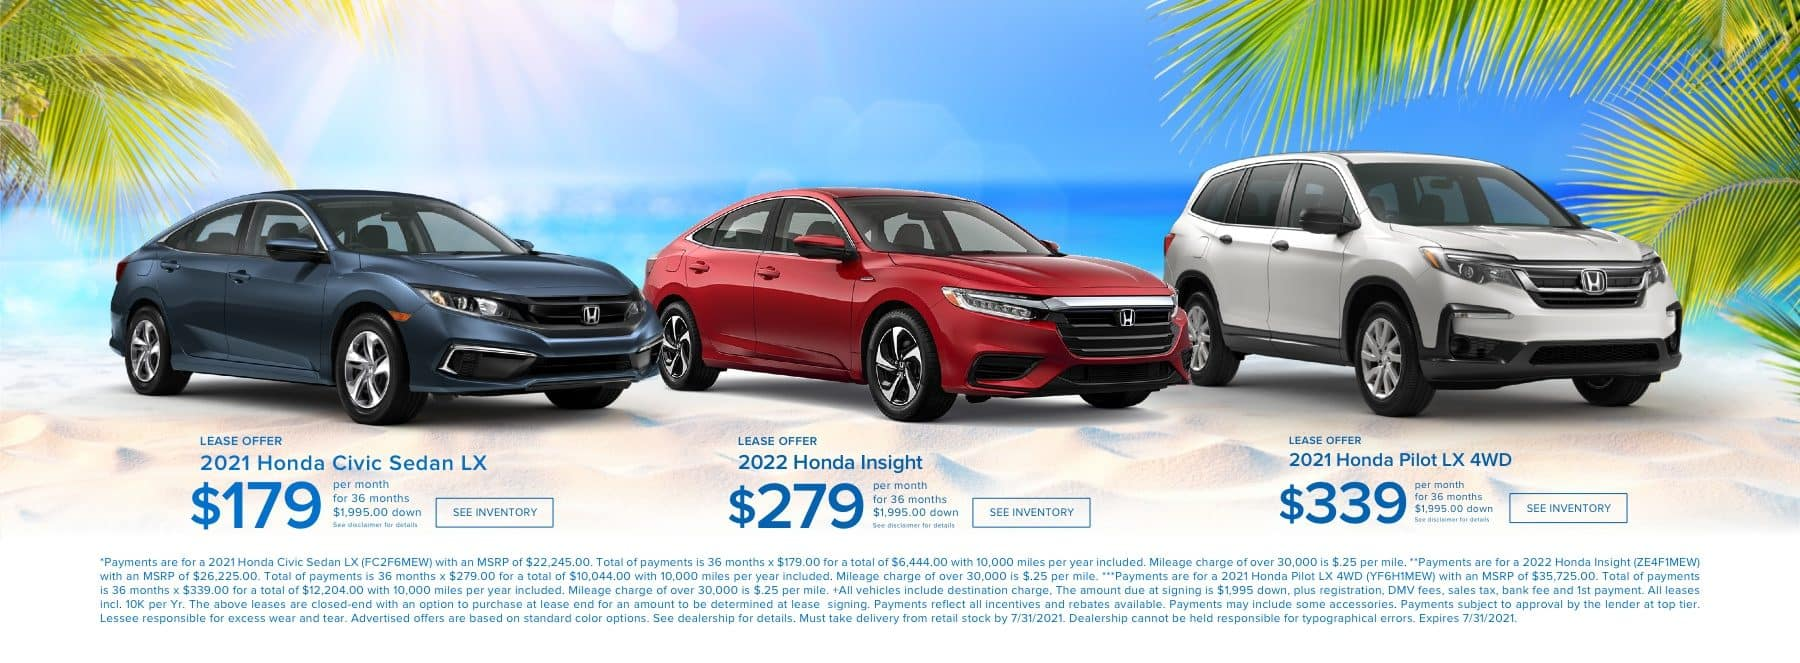 Lease Offers for Honda Civic, Honda Insight and Honda Pilot LX